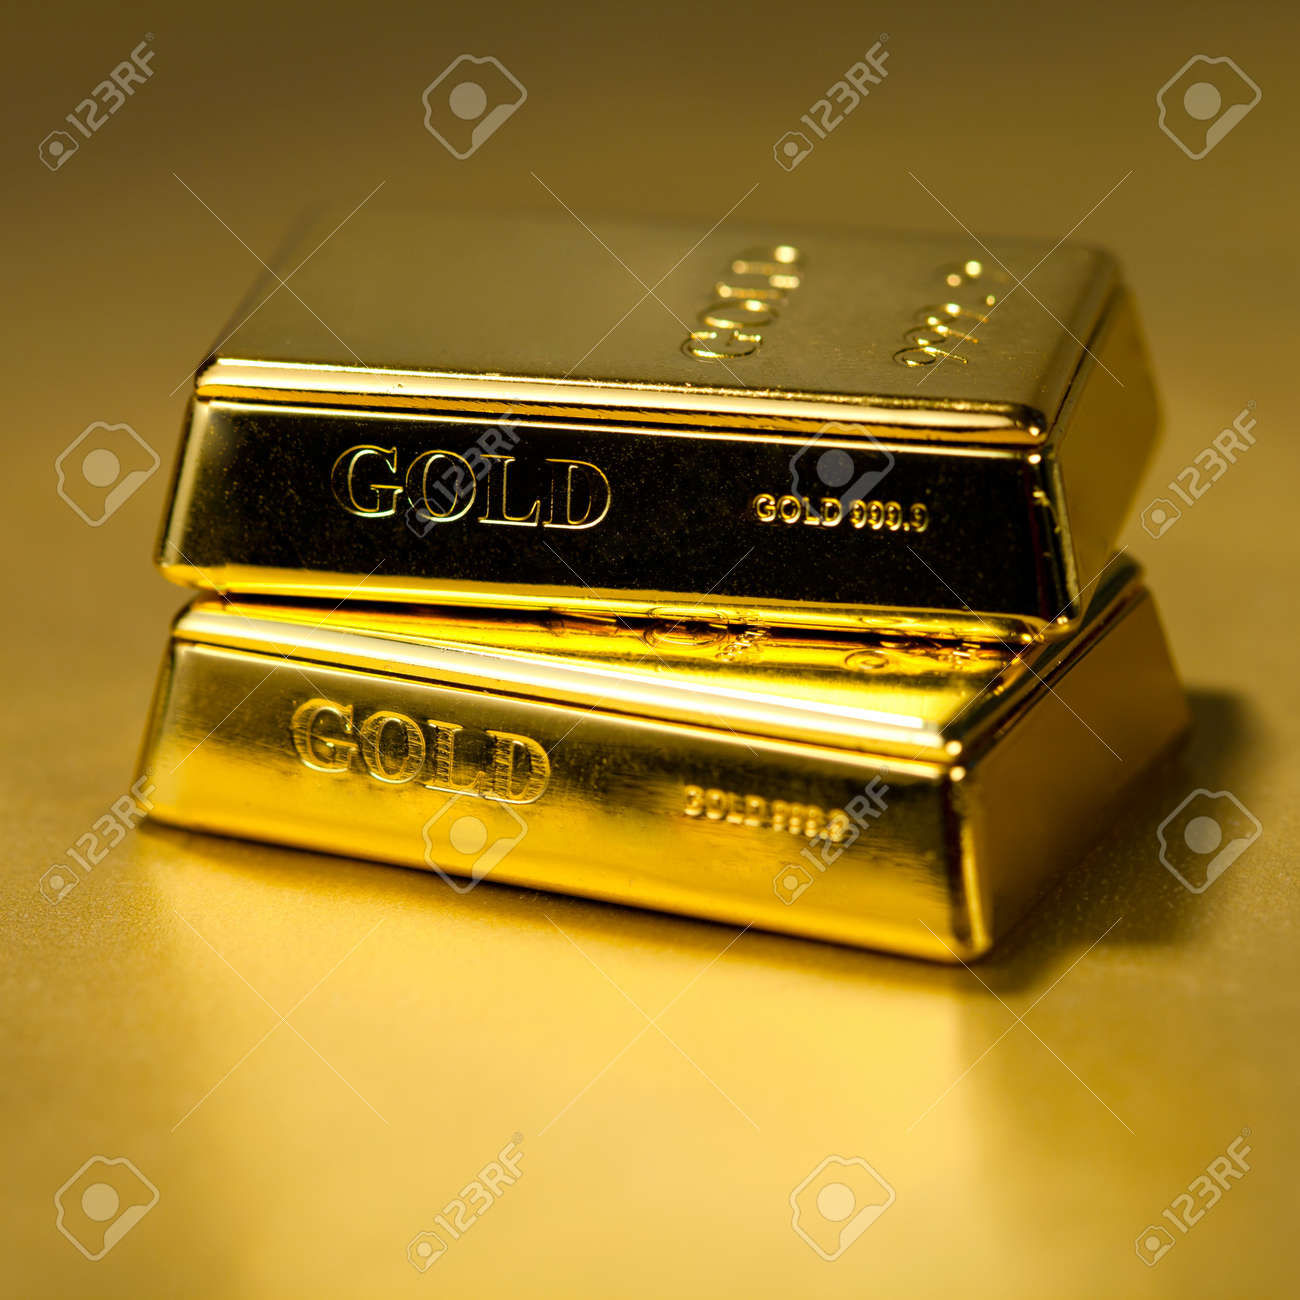 Two Gold bullions on golden background Stock Photo - 13471587